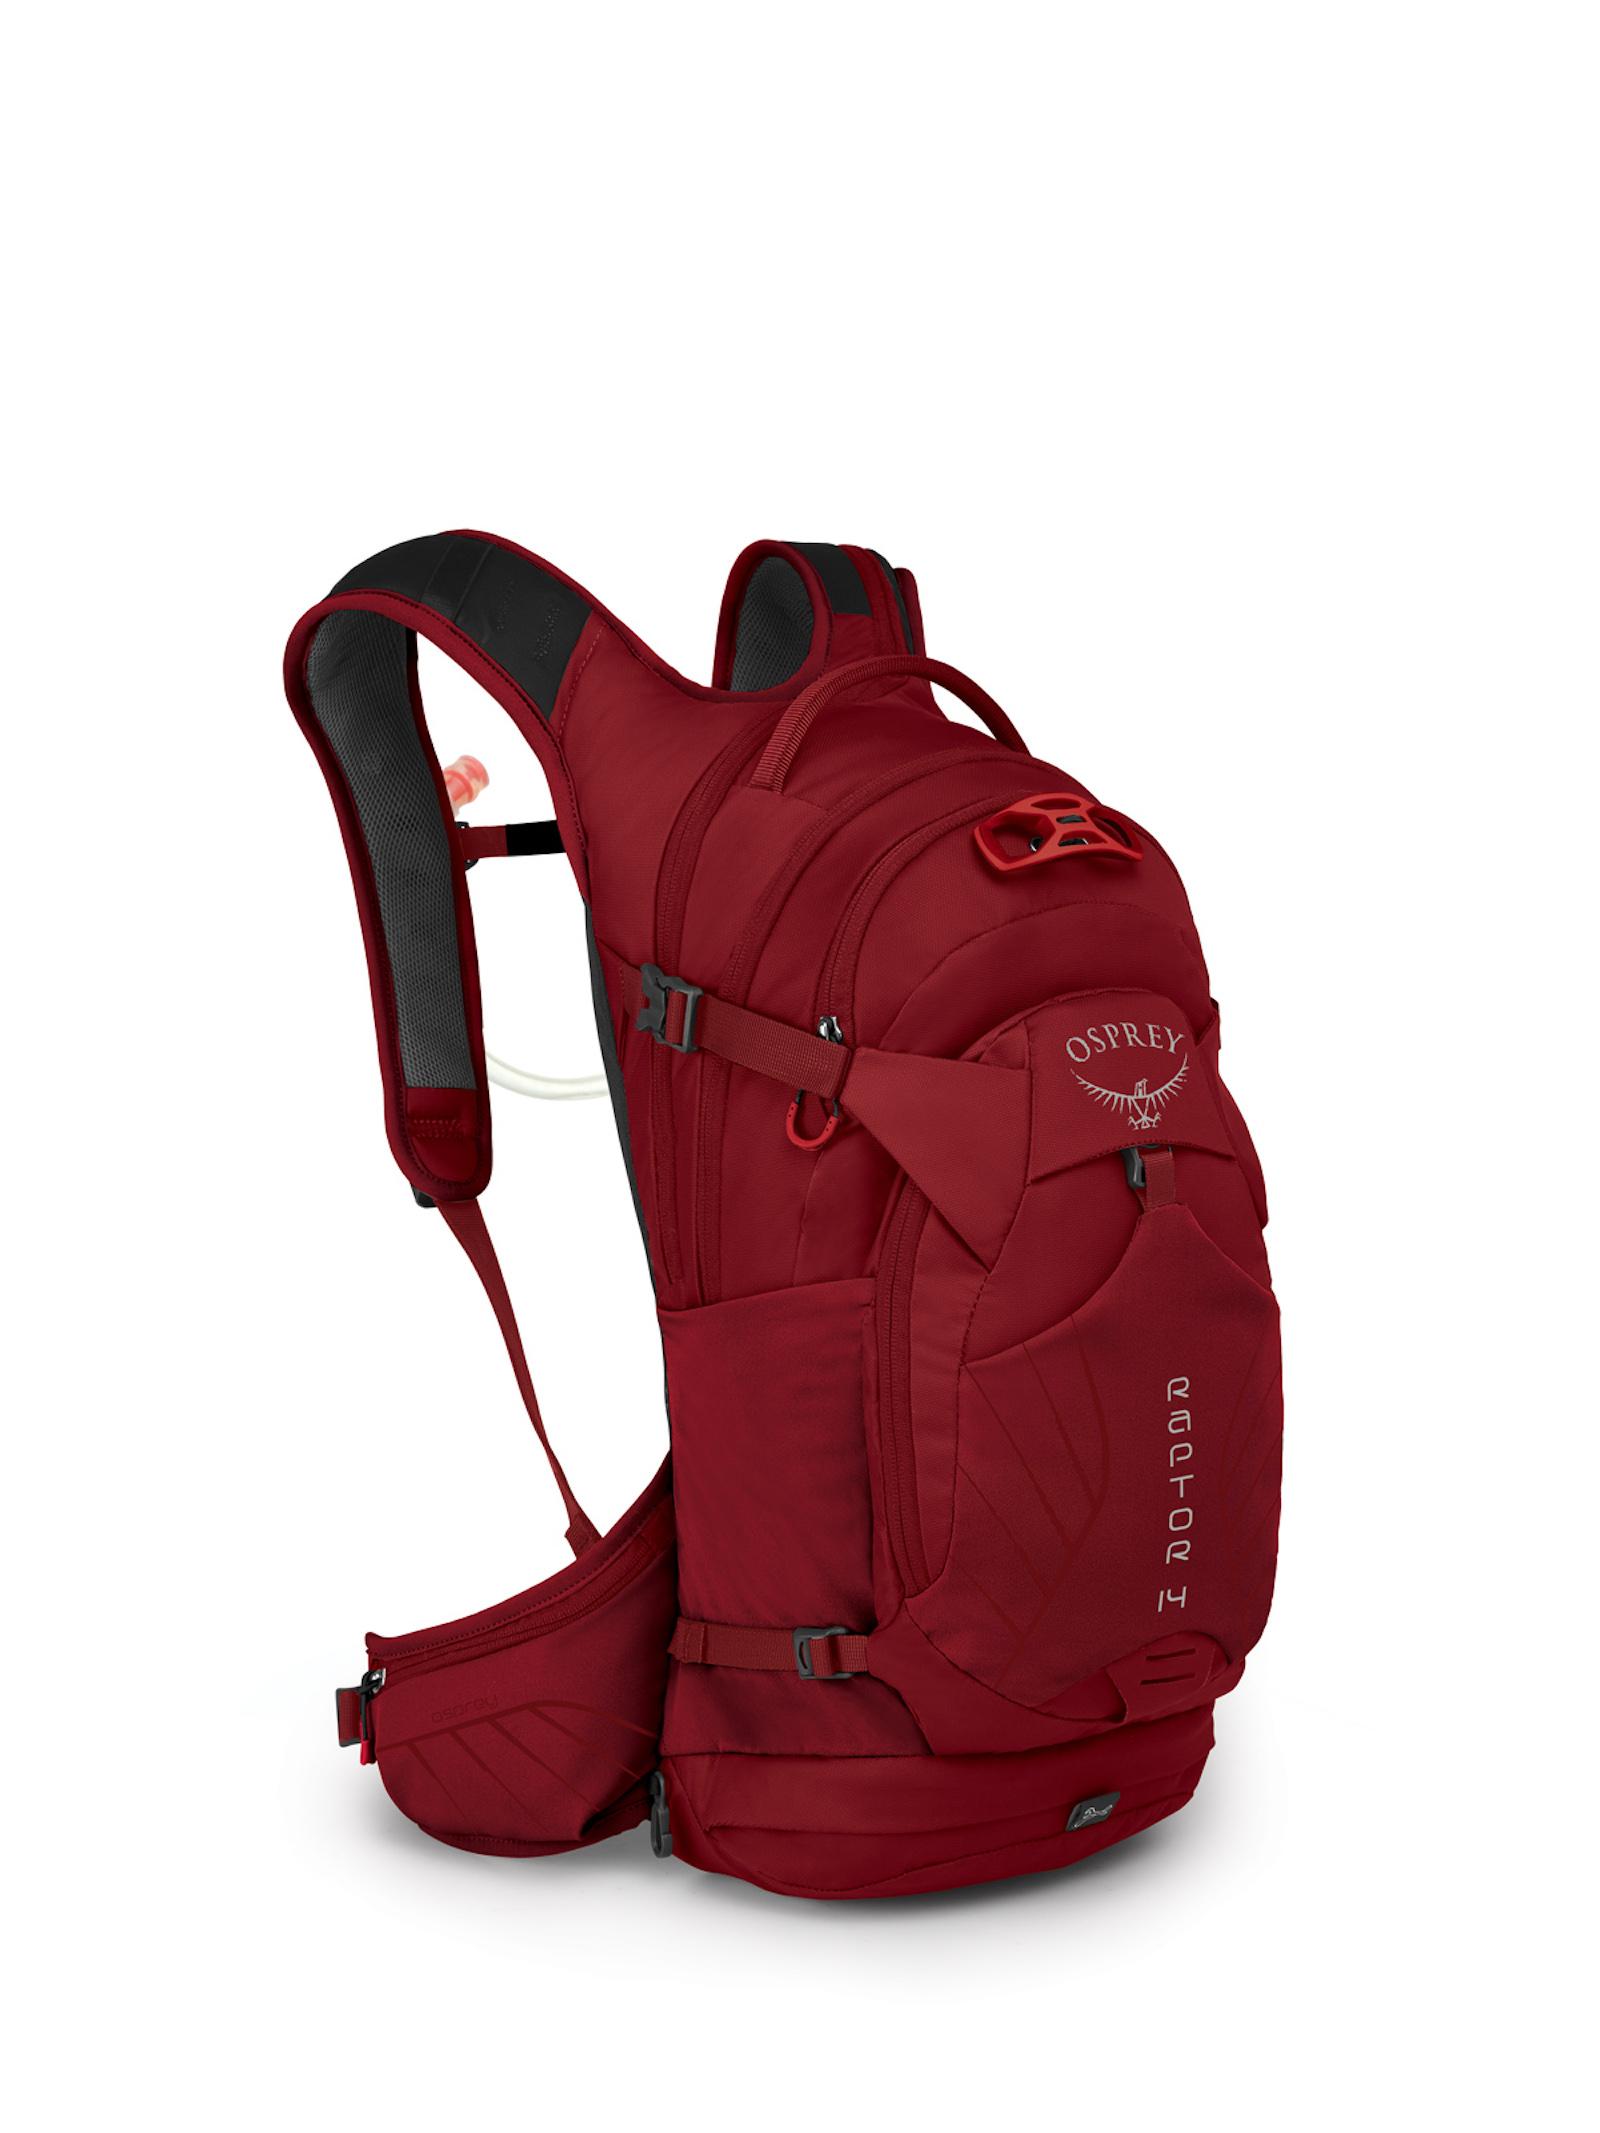 Osprey Mountain Bike Pack